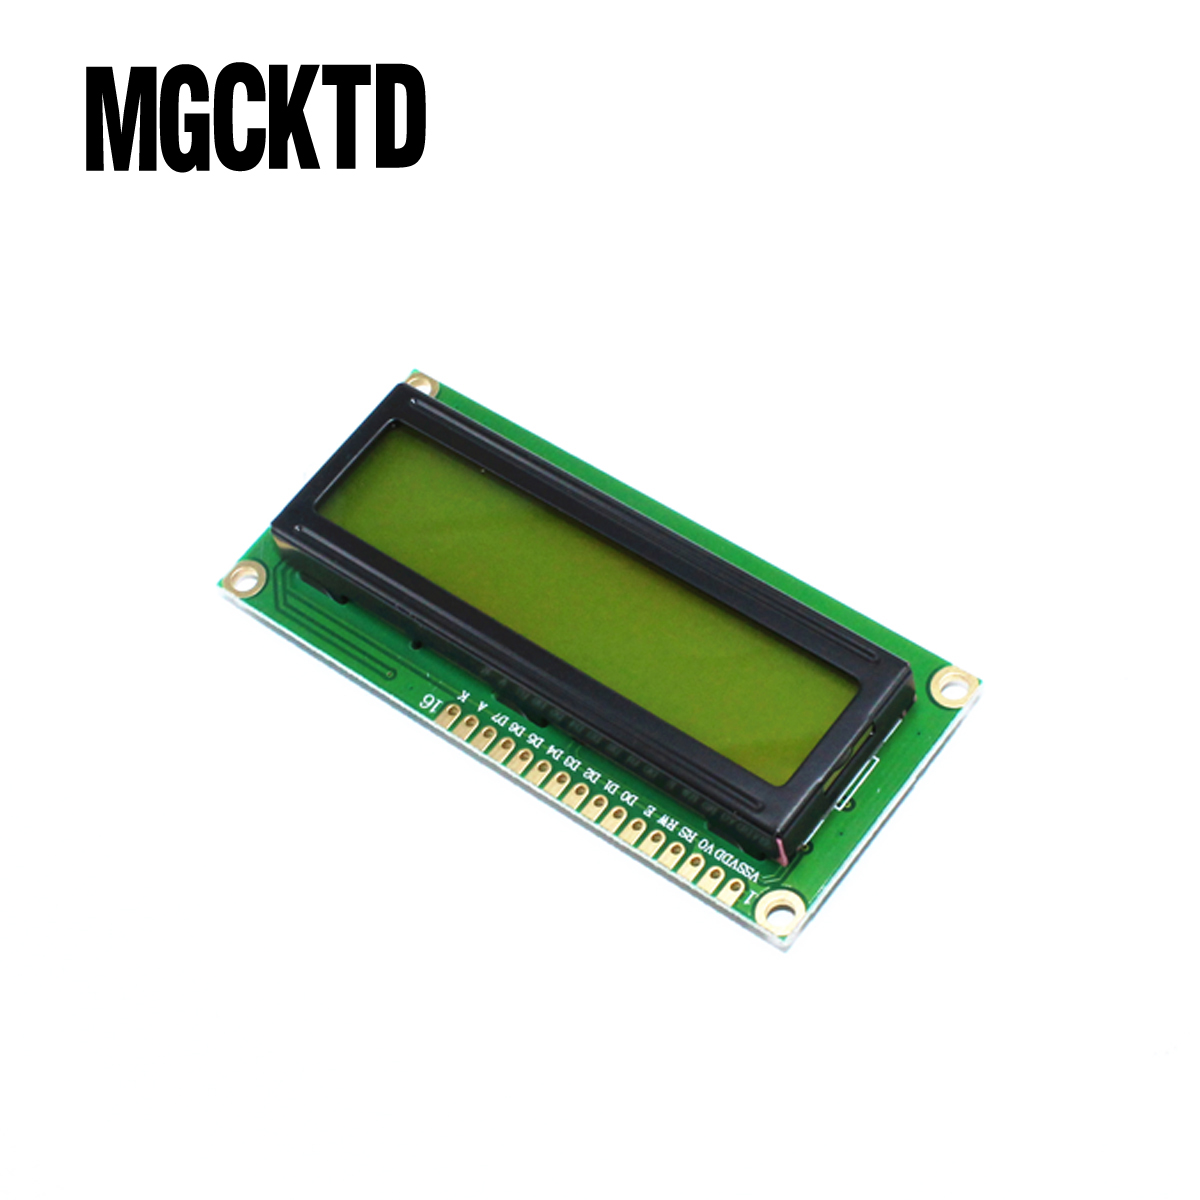 5 unids/lote 1602 LCD 16*2 caracteres pantalla del módulo LCD/LCM con amarillo verde